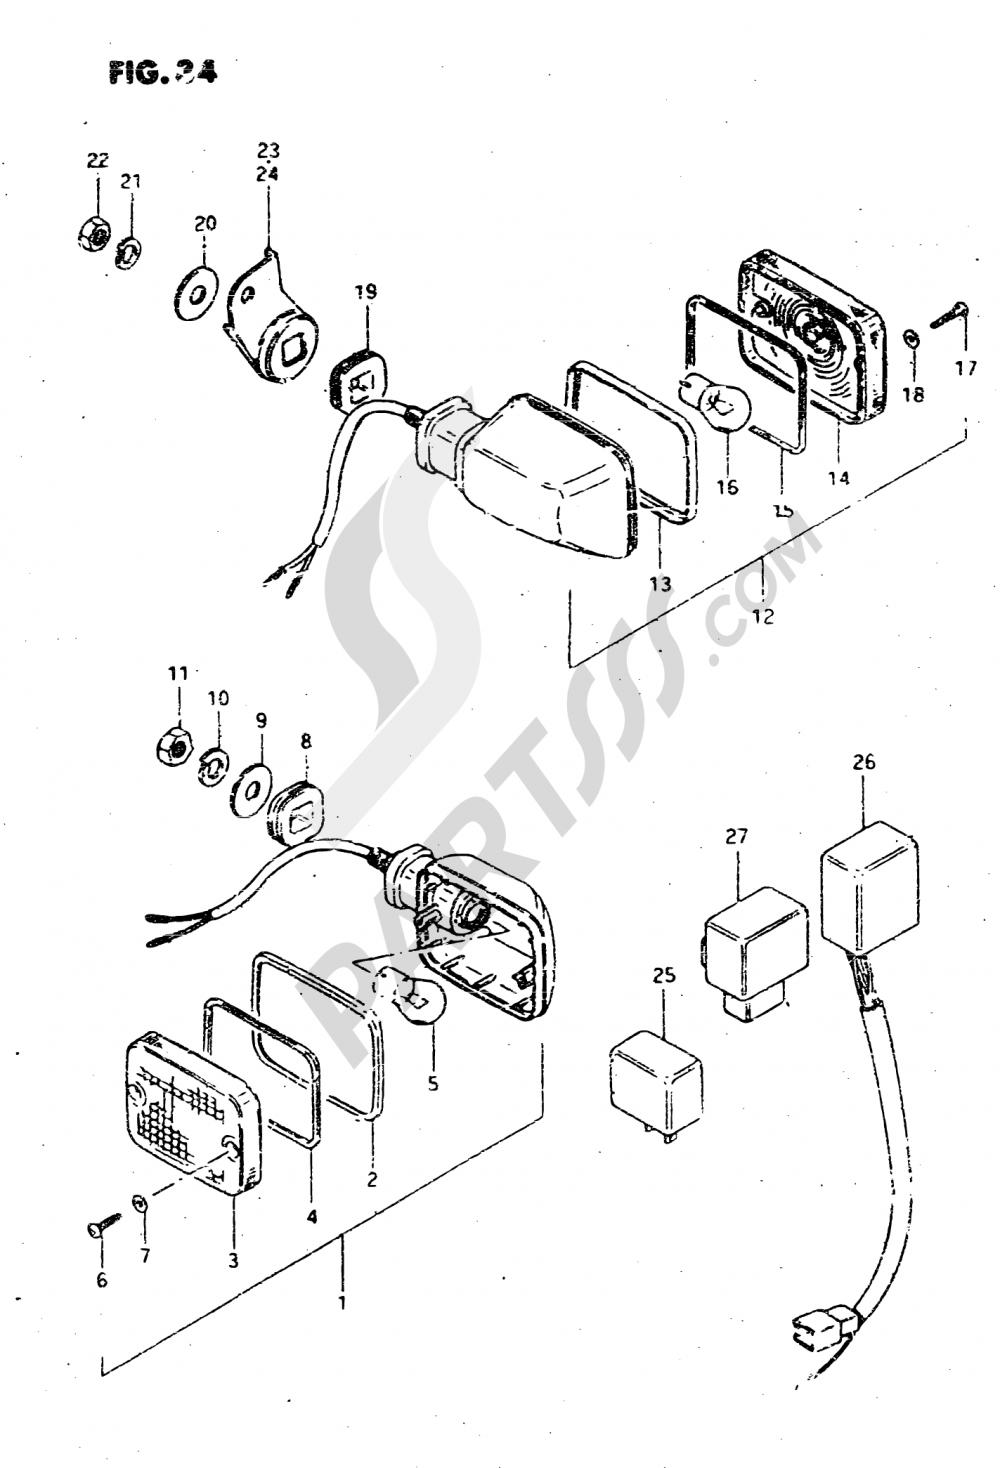 34 - TURN SIGNAL LAMP Suzuki GSX750S 1982